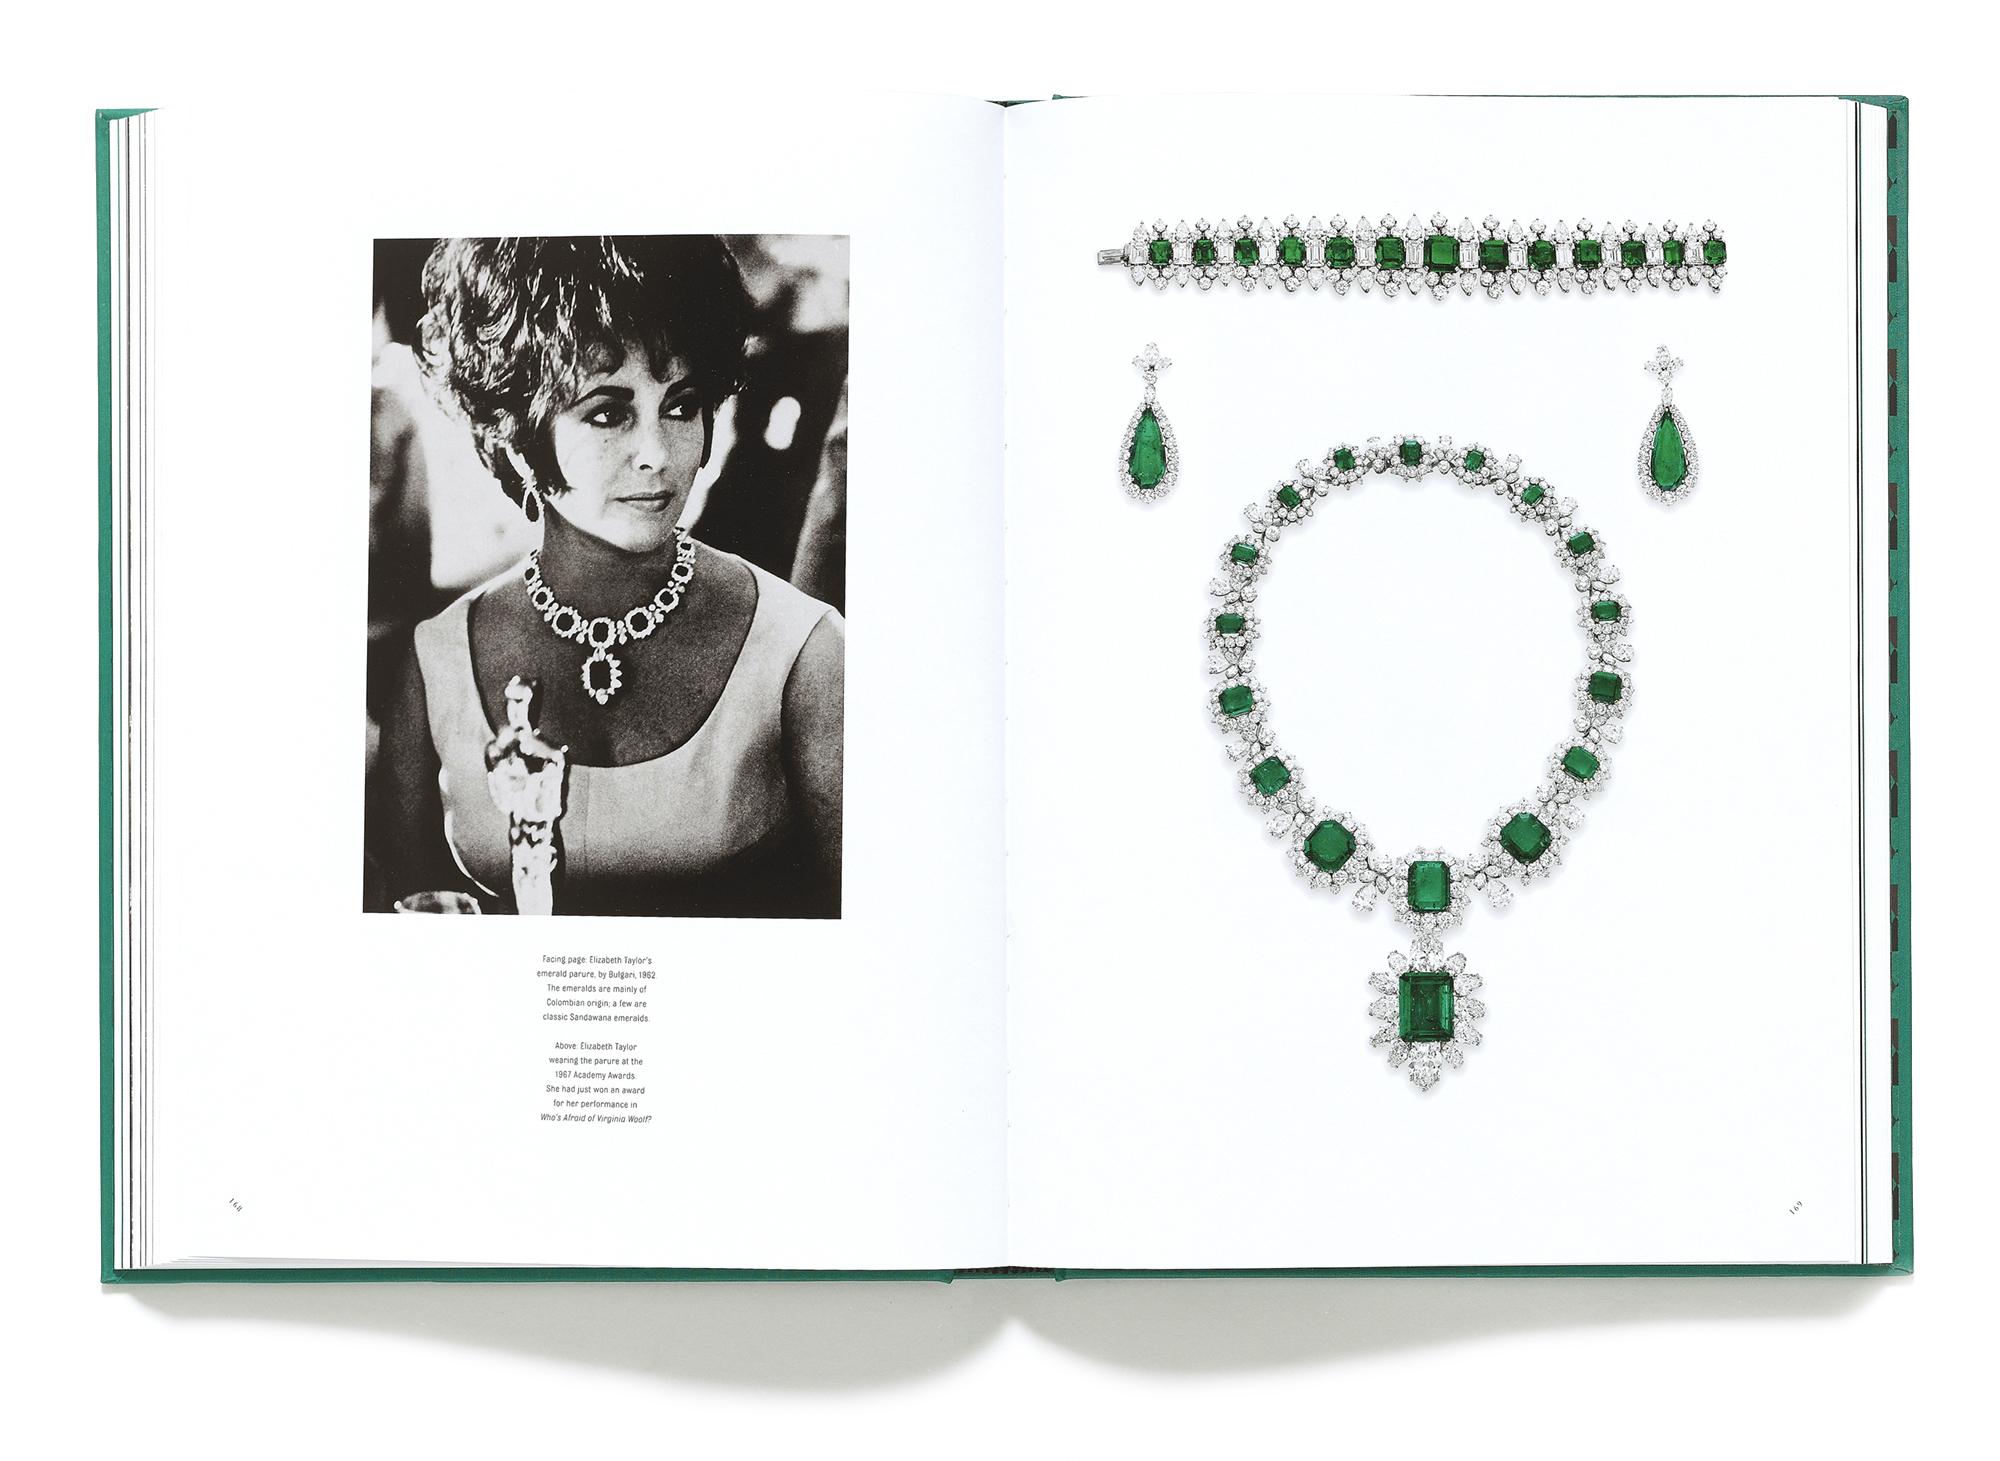 Emerald_Violette Editions_40.jpg